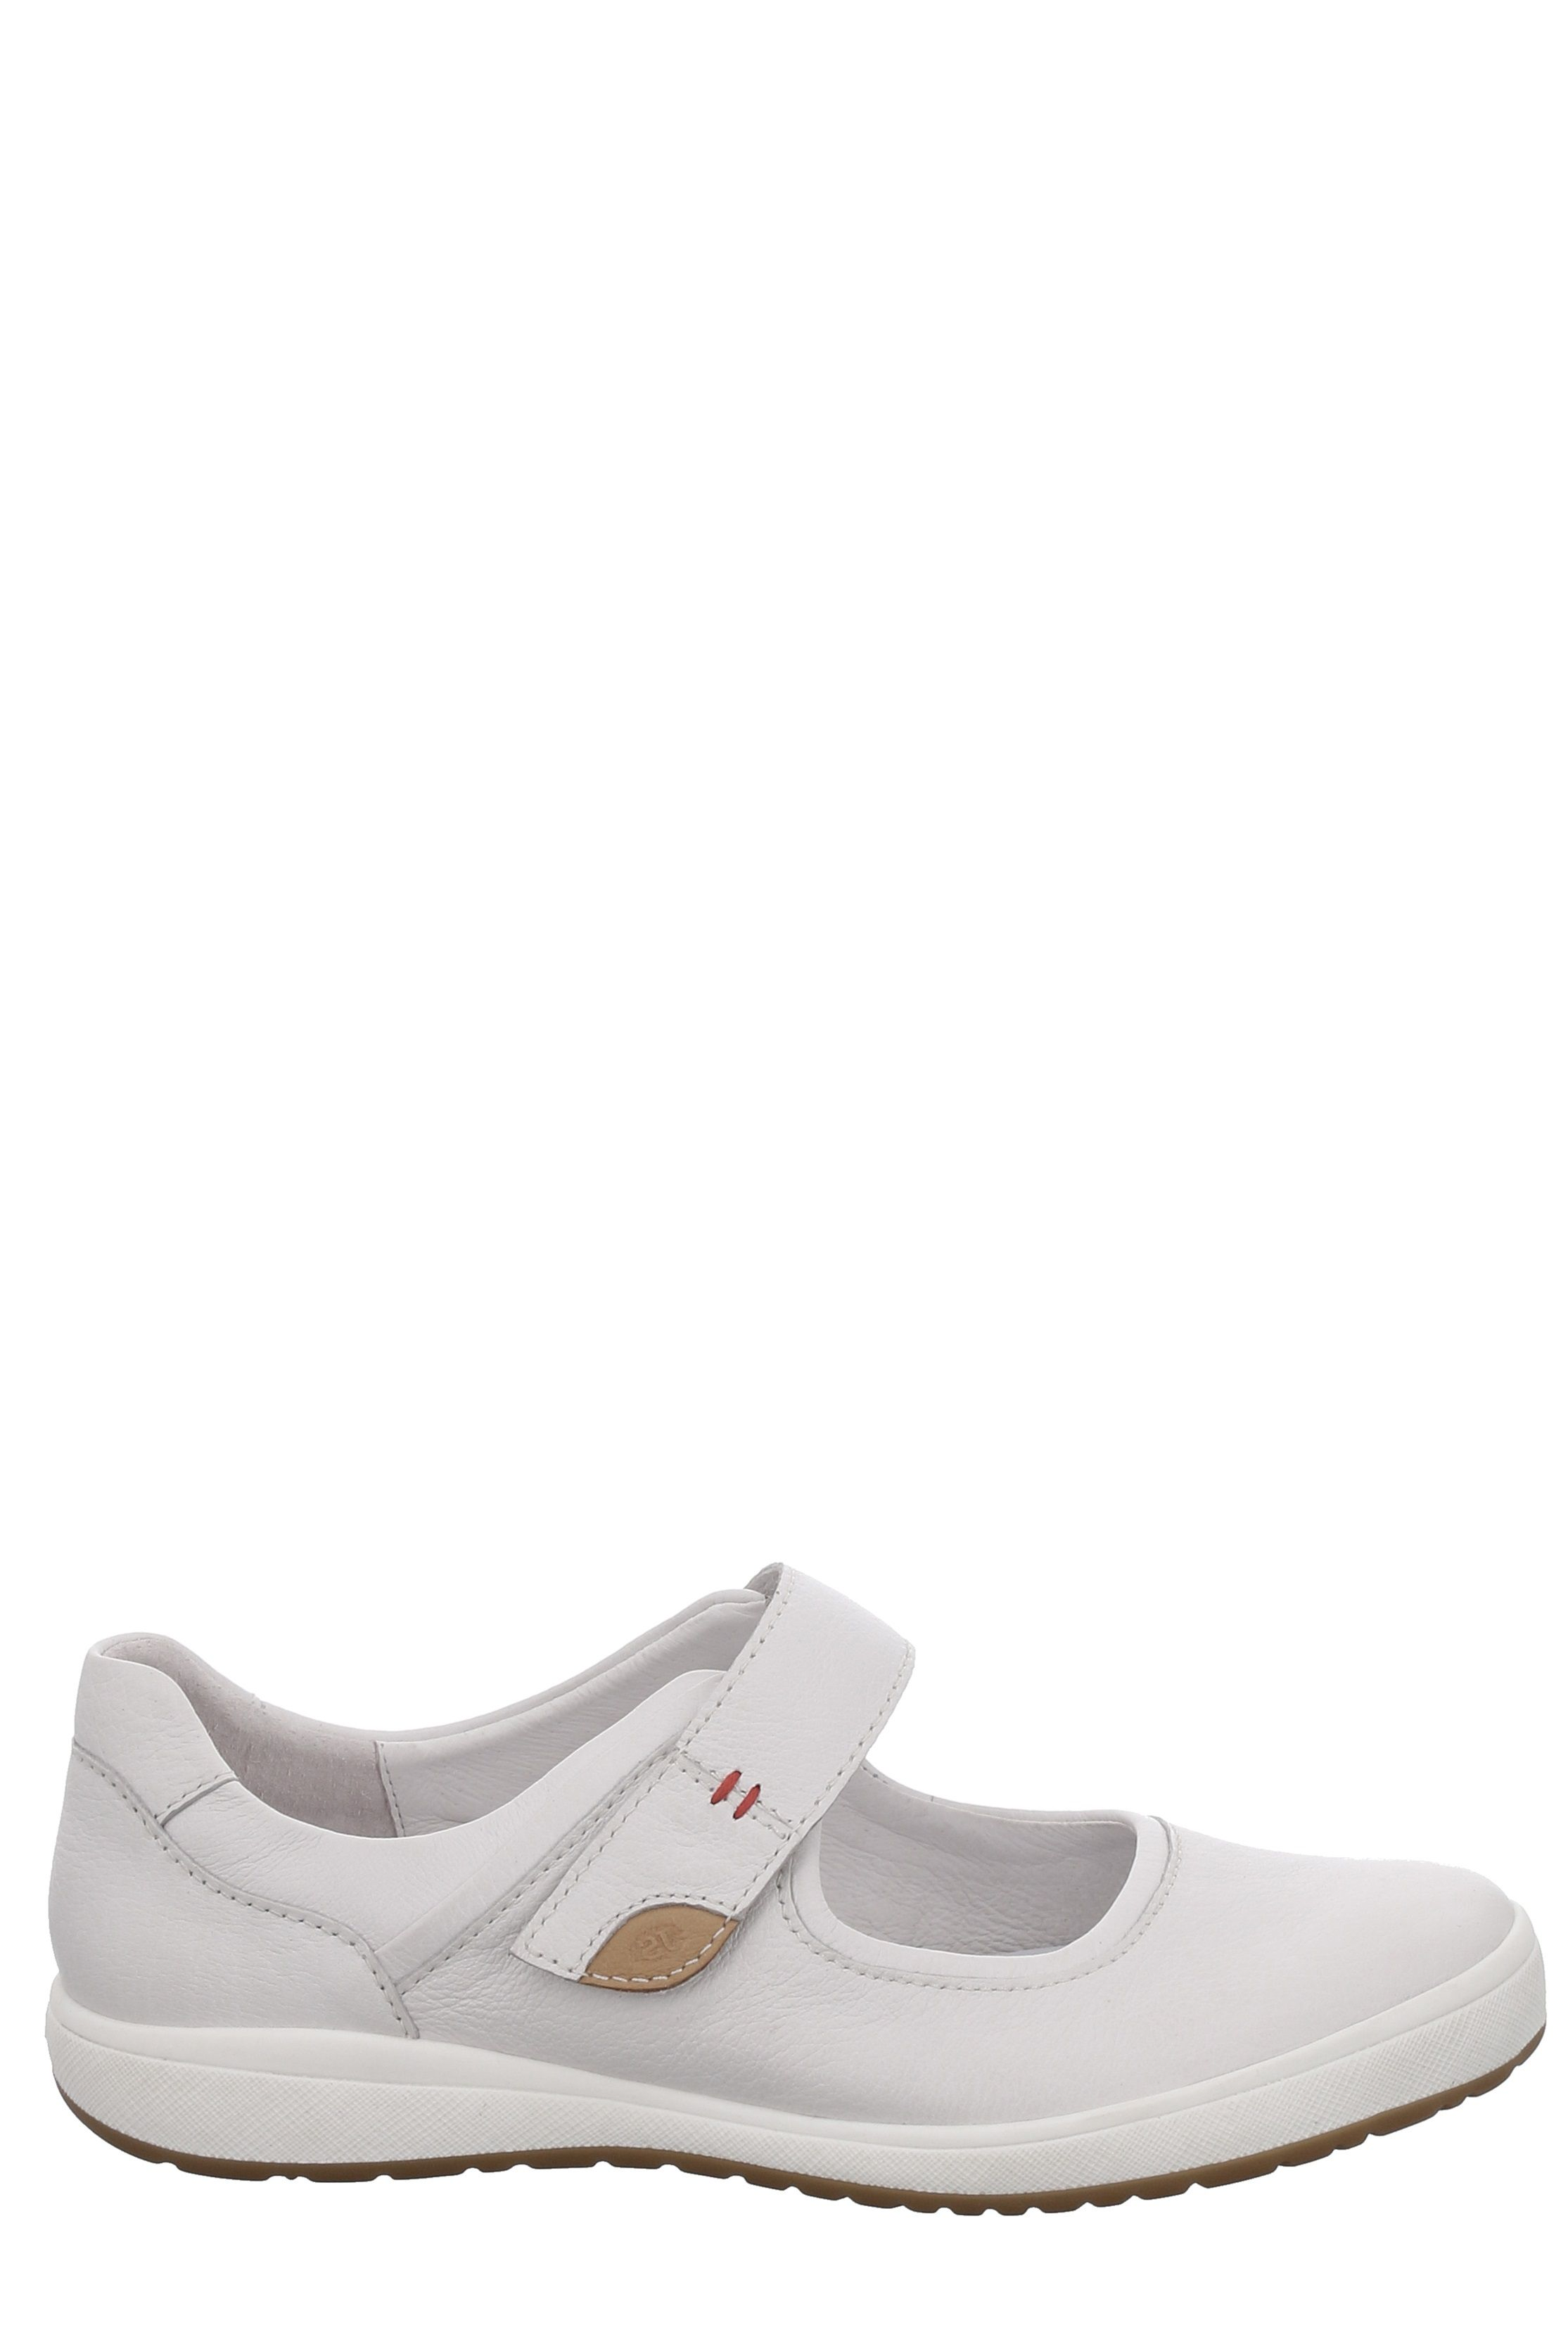 Josef Seibel Caren 05 Sneakers | Long